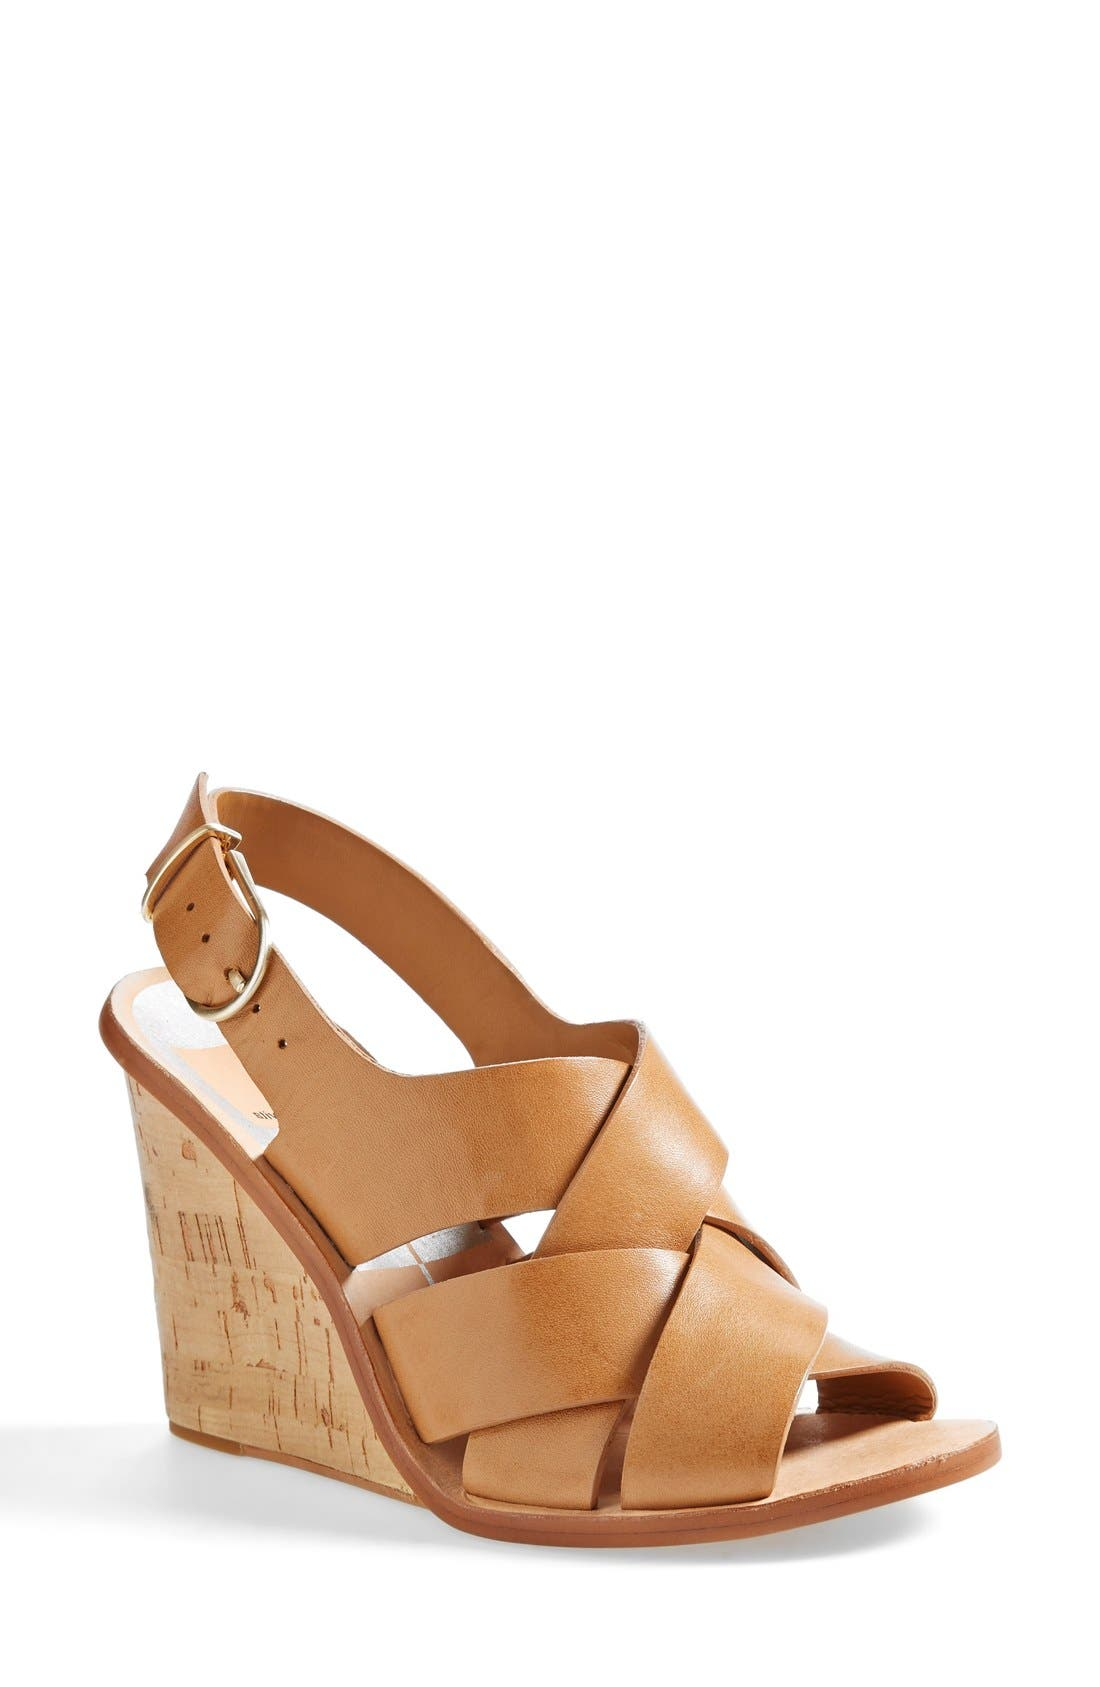 Alternate Image 1 Selected - Dolce Vita 'Remie' Sandal (Women)